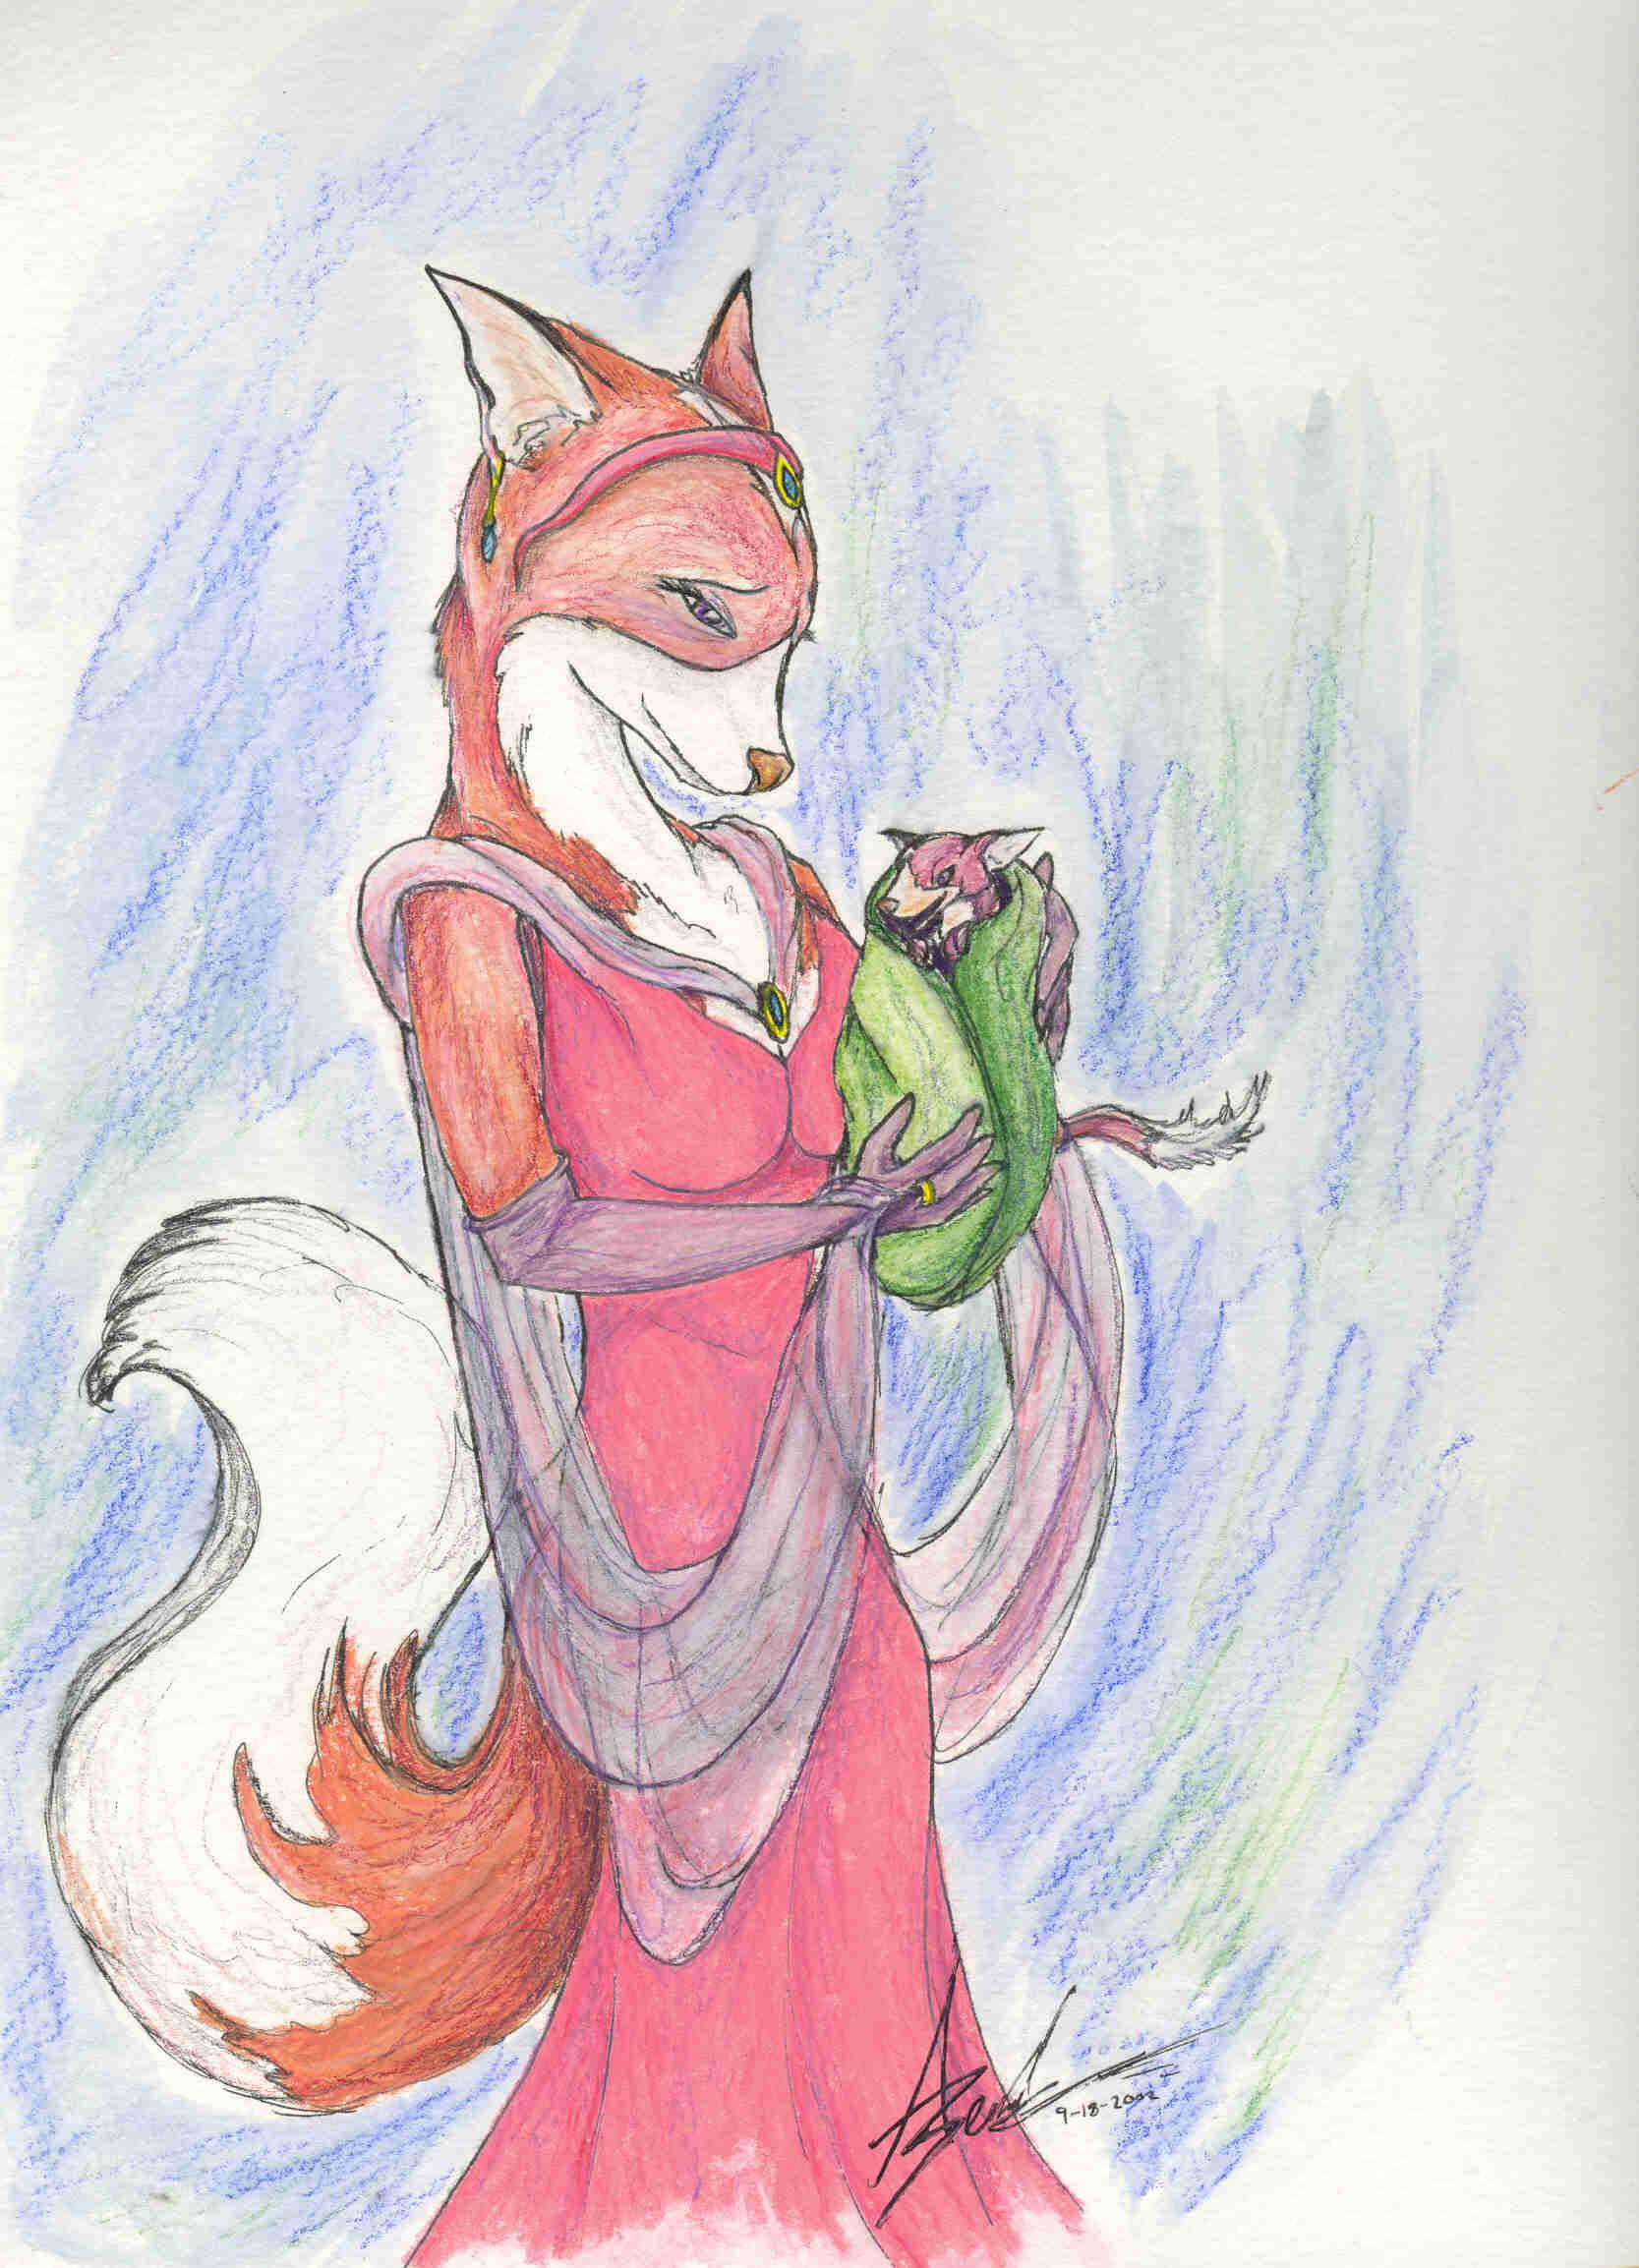 (c) Fara Phoenix